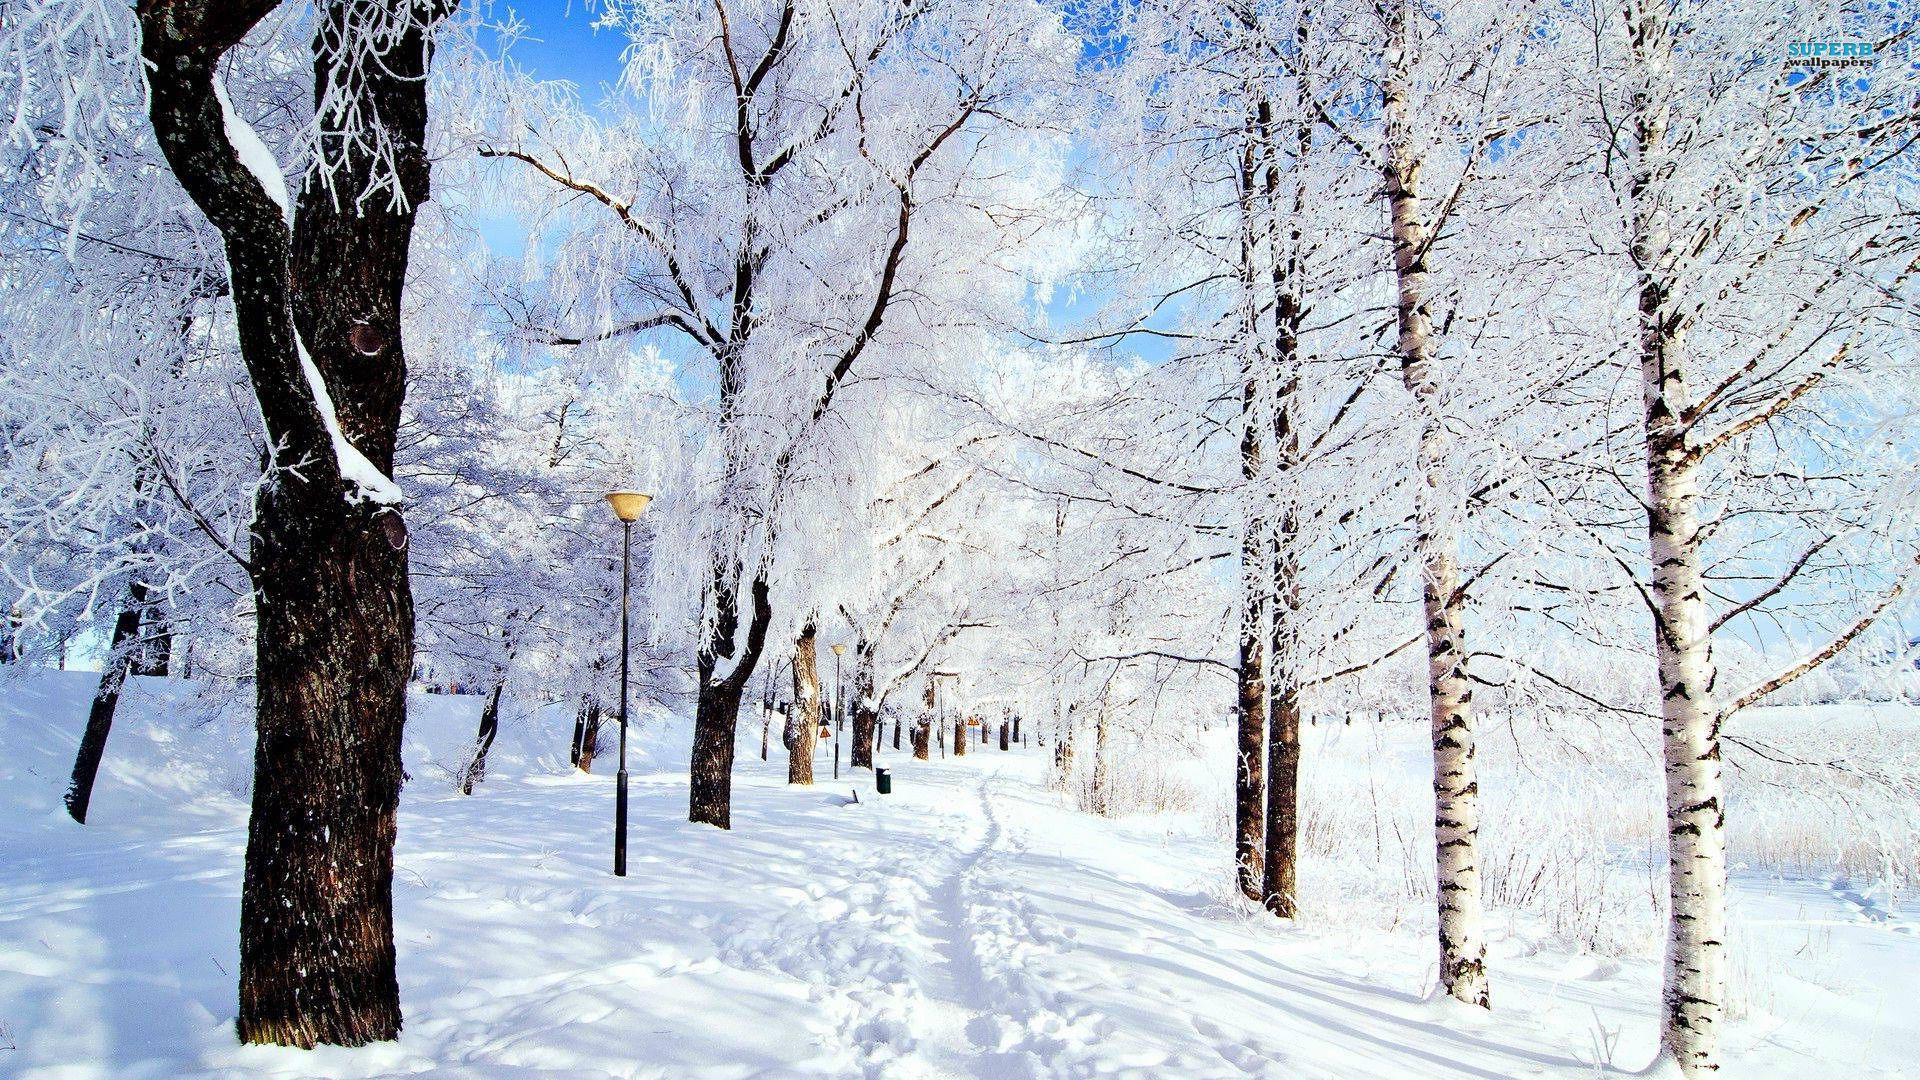 Cool Wallpaper Love Winter - f07bc63b9524b1b1aab5a6557f8637cc  You Should Have_893629.jpg